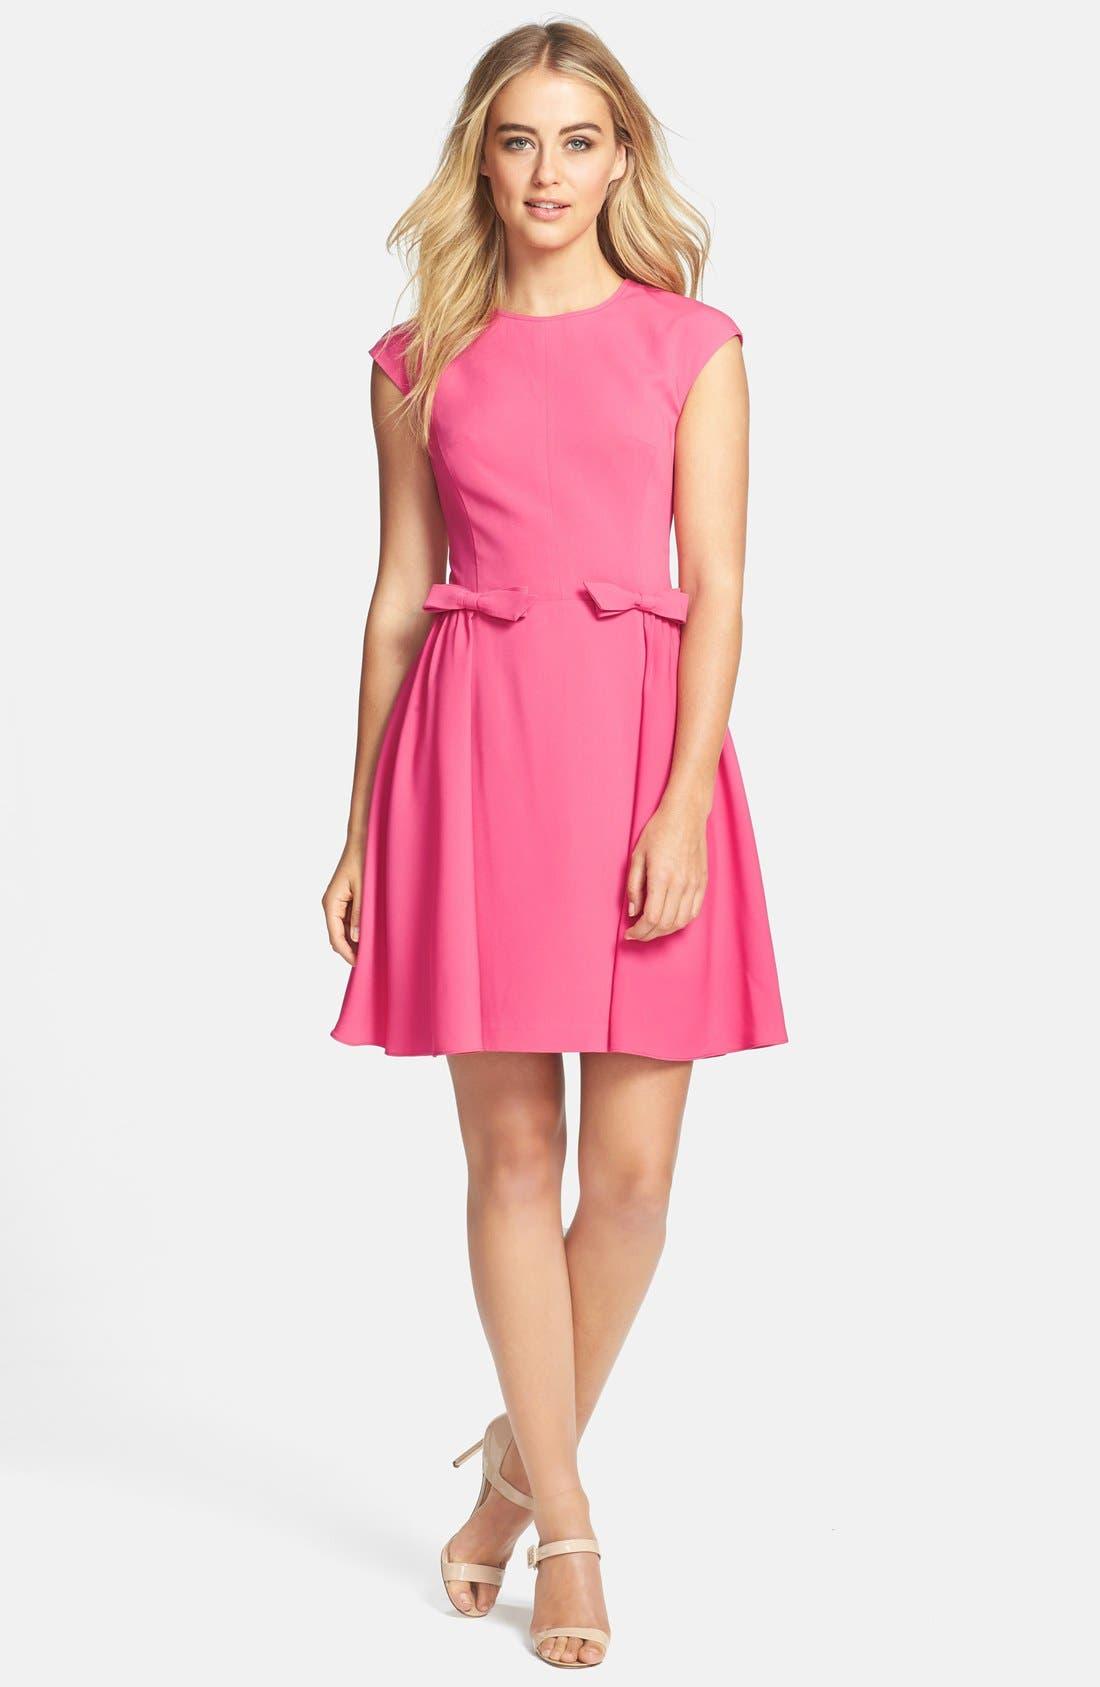 Alternate Image 1 Selected - Jill Jill Stuart Bow Detail Crepe Fit & Flare Dress